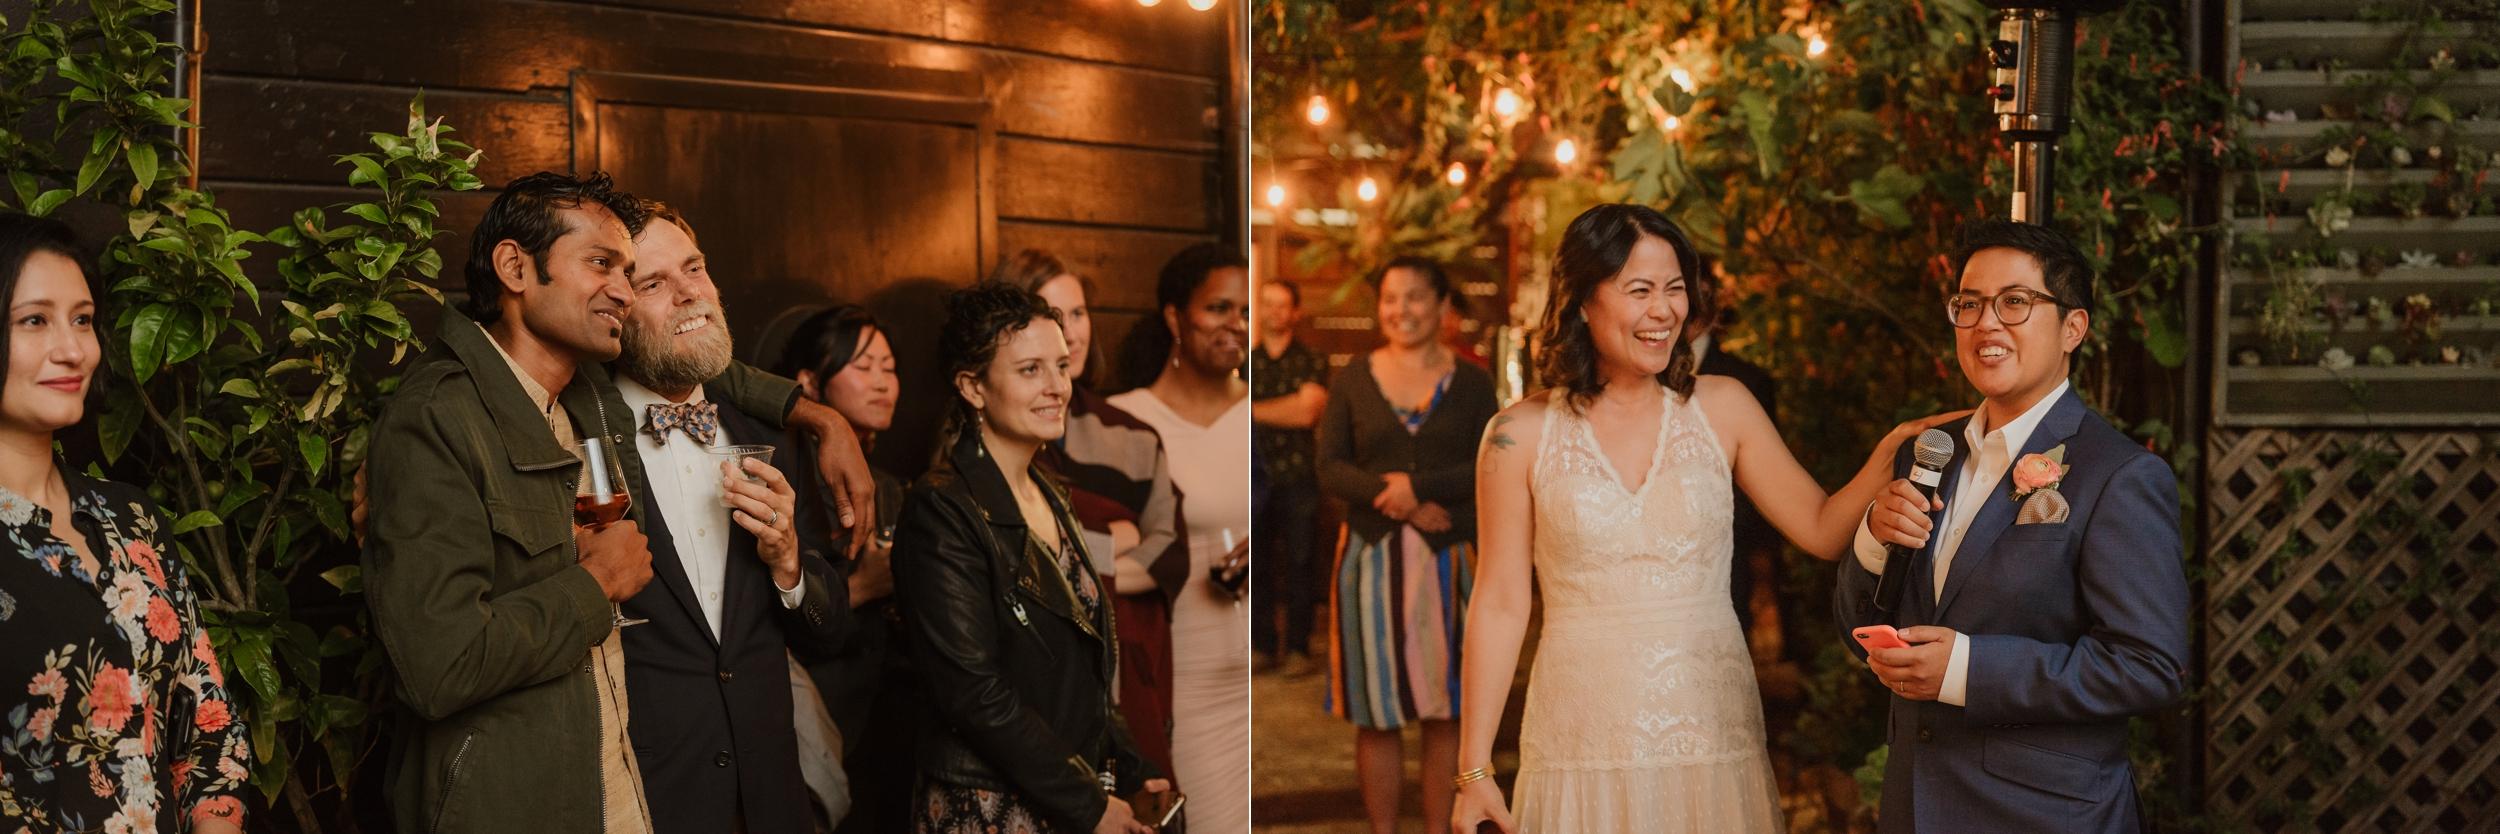 089-89-san-francisco-city-hall-stable-cafe-wedding-vivianchen-560_WEB.jpg